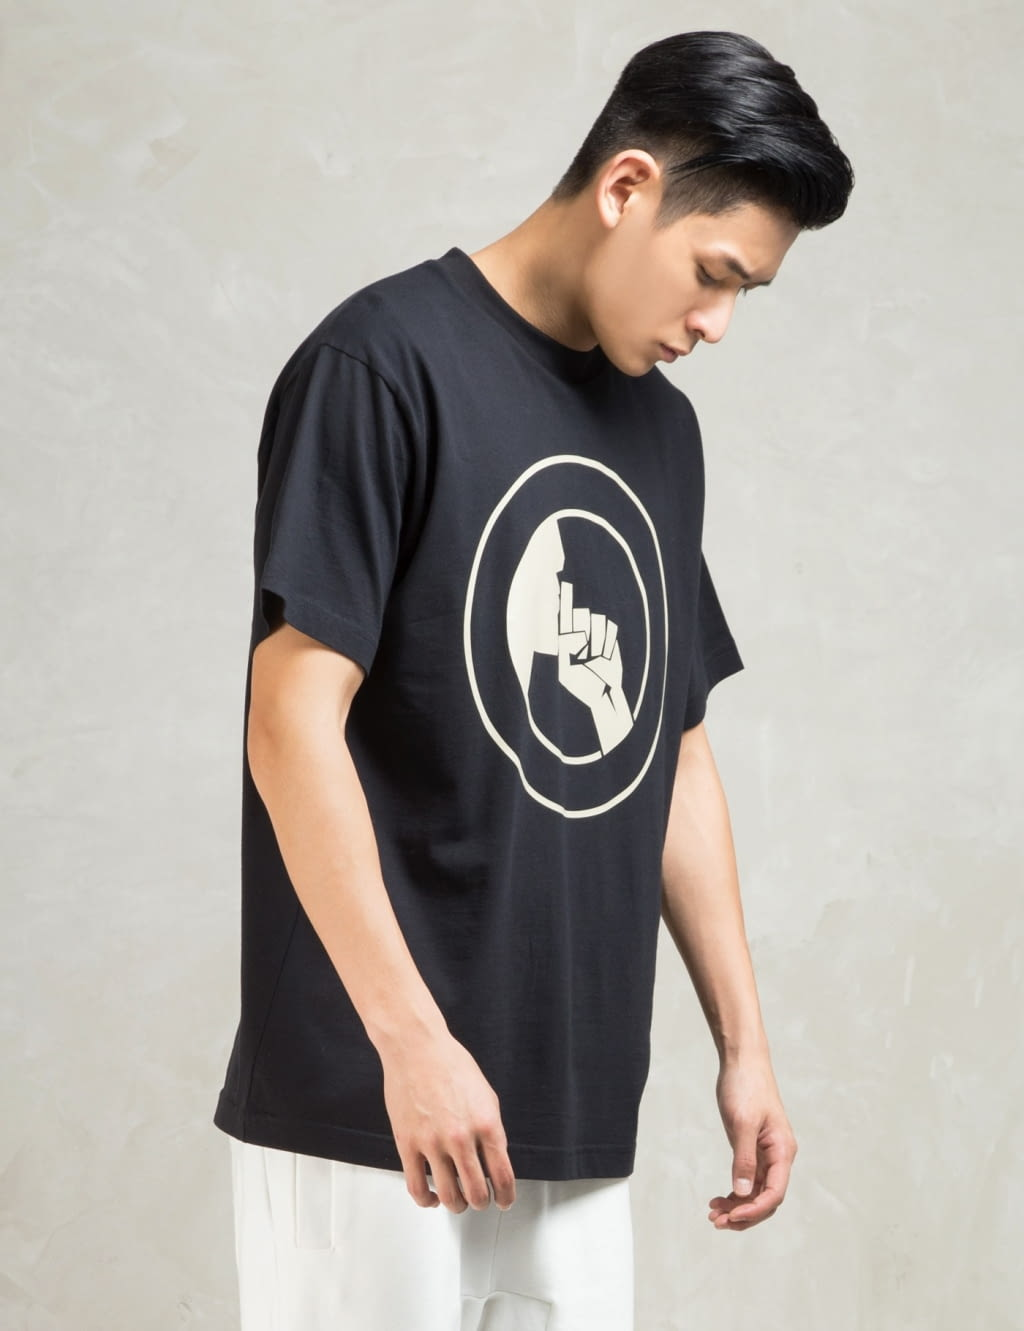 Buy Original Sons Black S Shush Crew T Shirt At Indonesia Bobobobo Baju Kaos Singlet Tanktop Fashion Pria